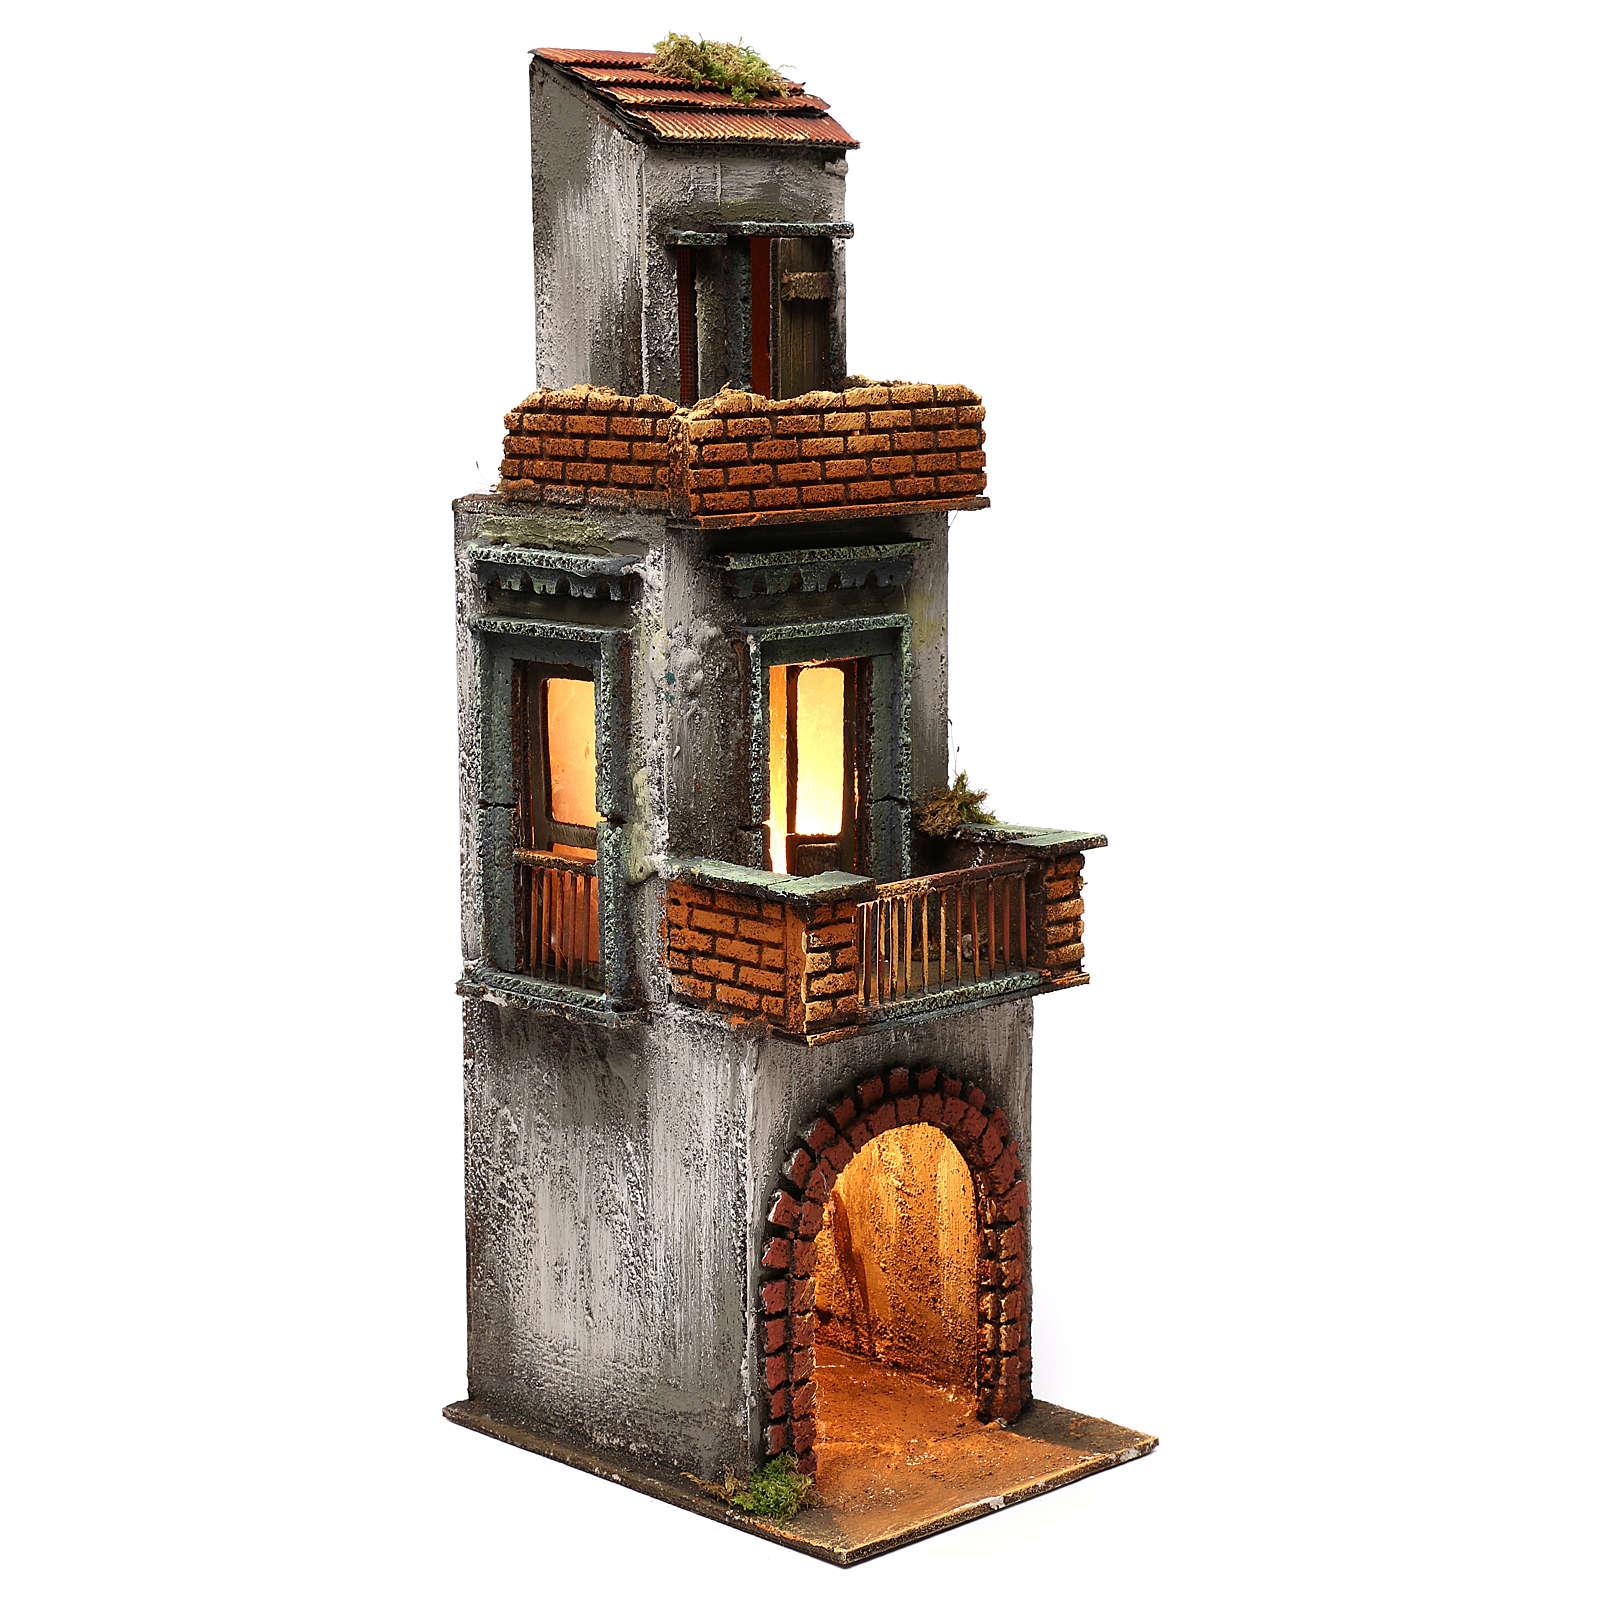 Bloque de viviendas de madera tres pisos belén napolitano 50x15x20 cm 4